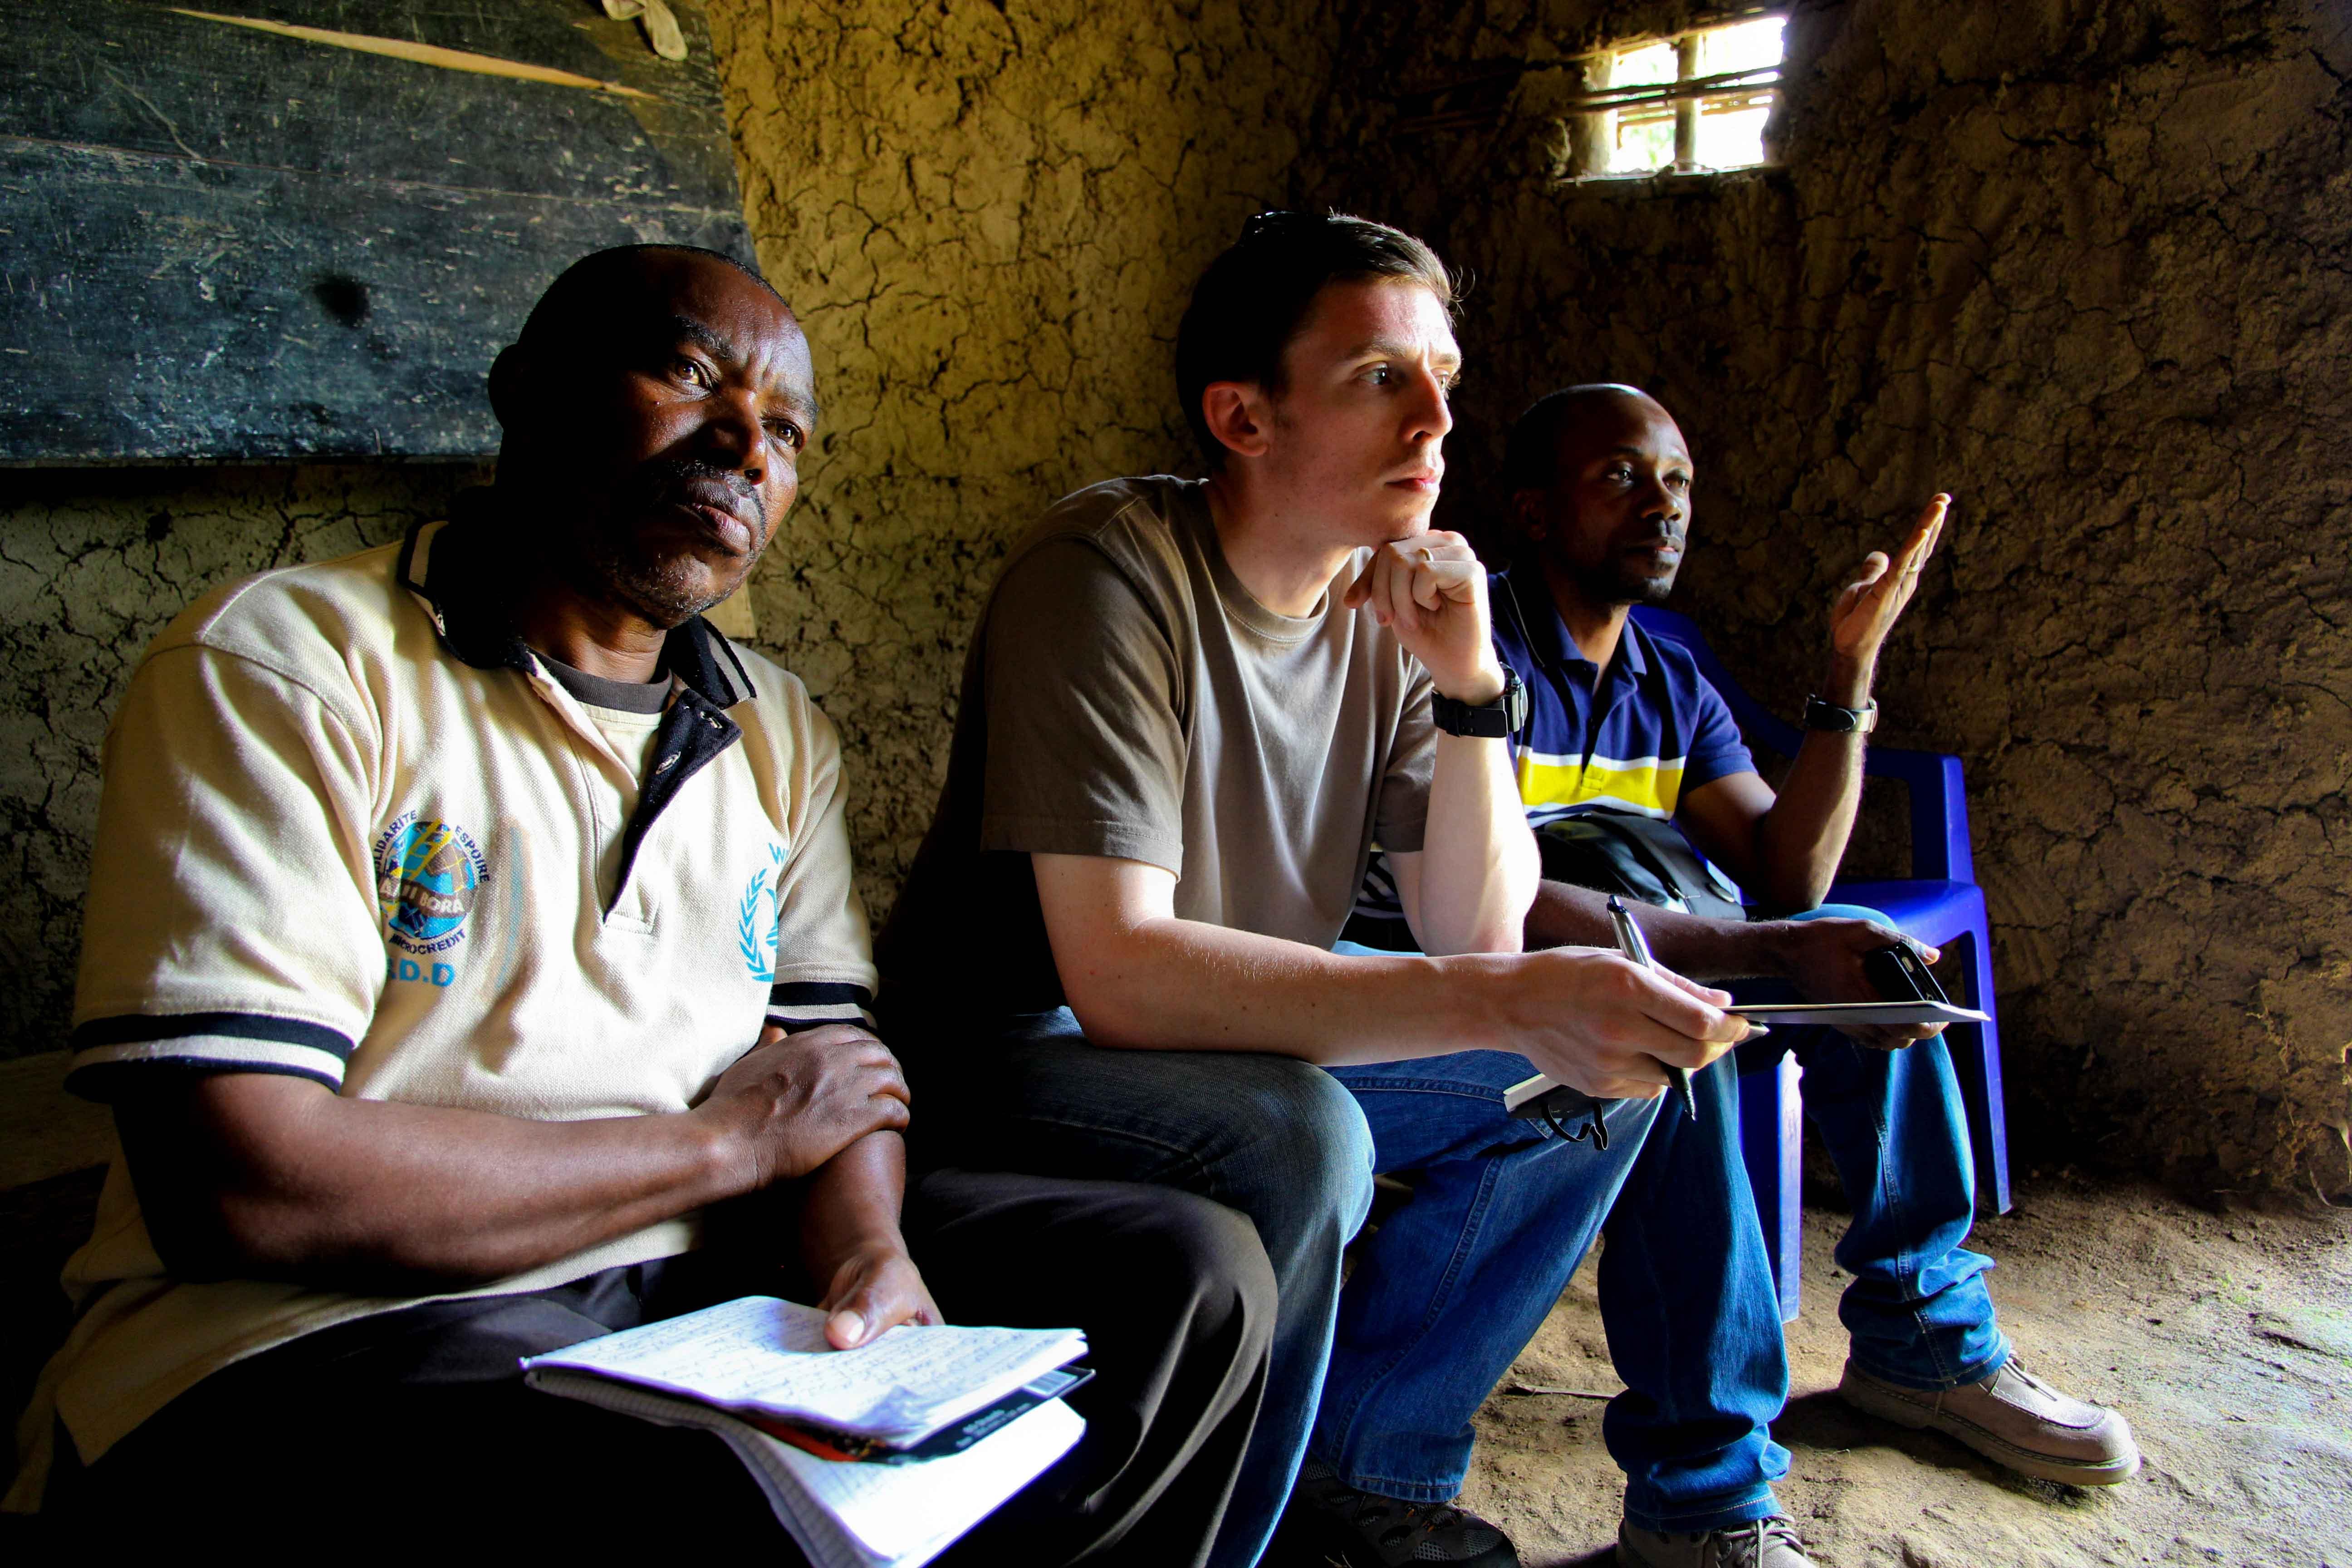 A translator joins Mavuno co-founders Dan Myatt and David Masomo at a meeting of rural community members in eastern Congo.